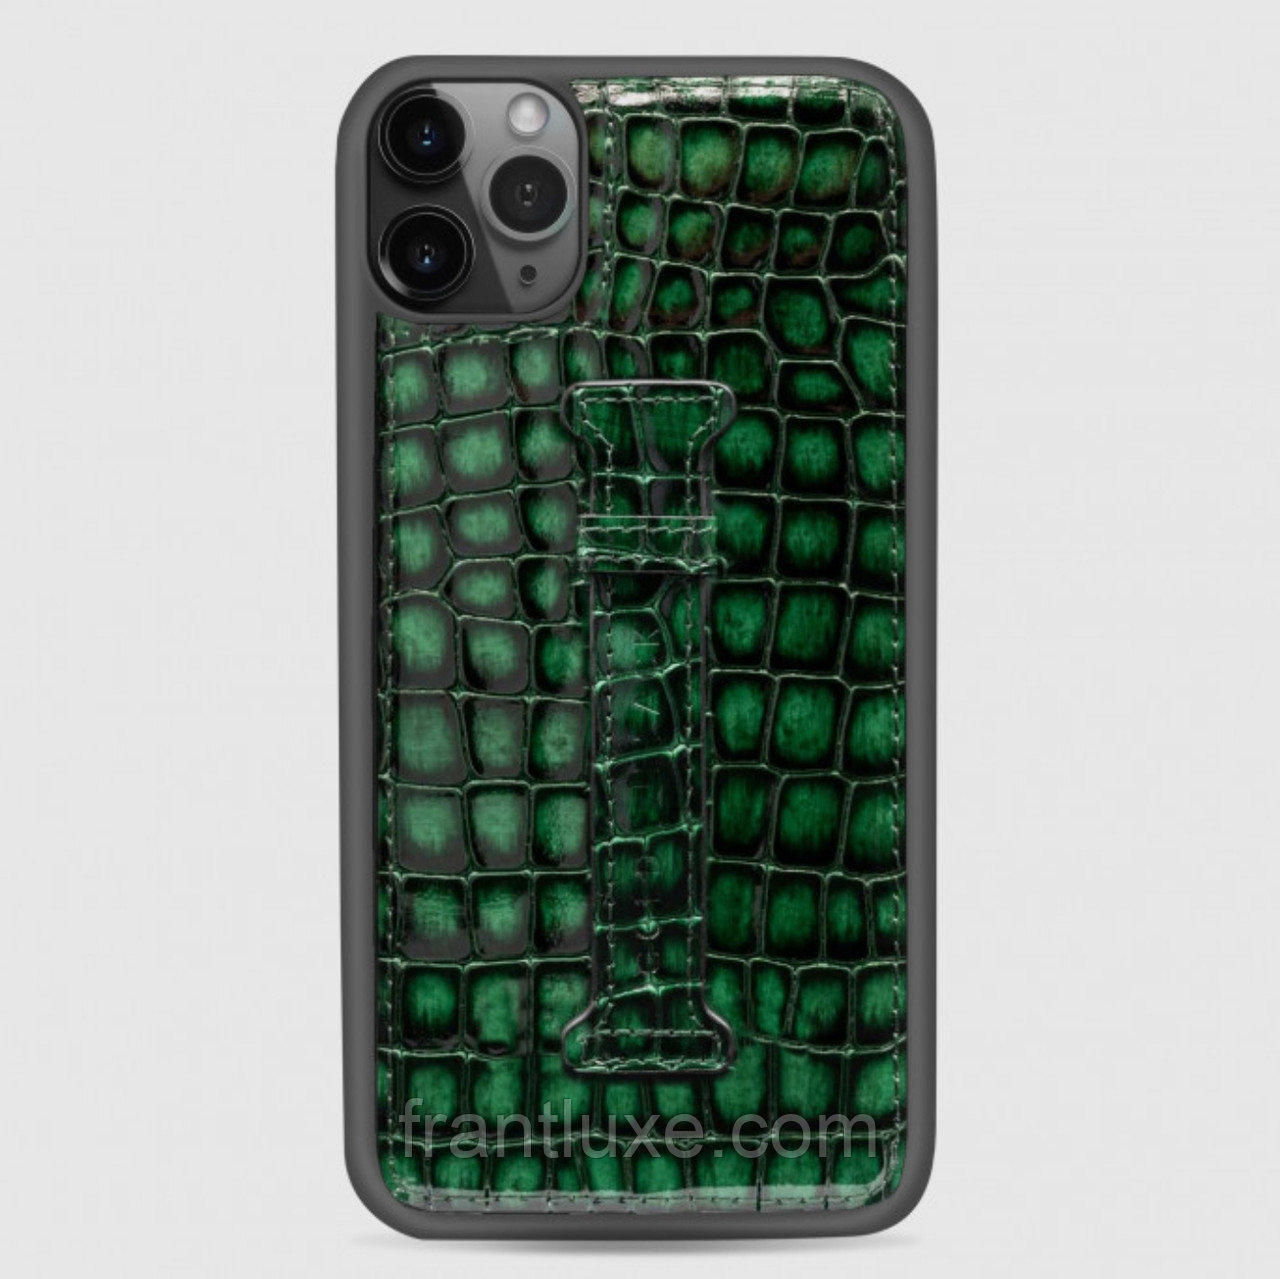 Чехол для телефона iPhone 11 Finger-holder Green - фото 1